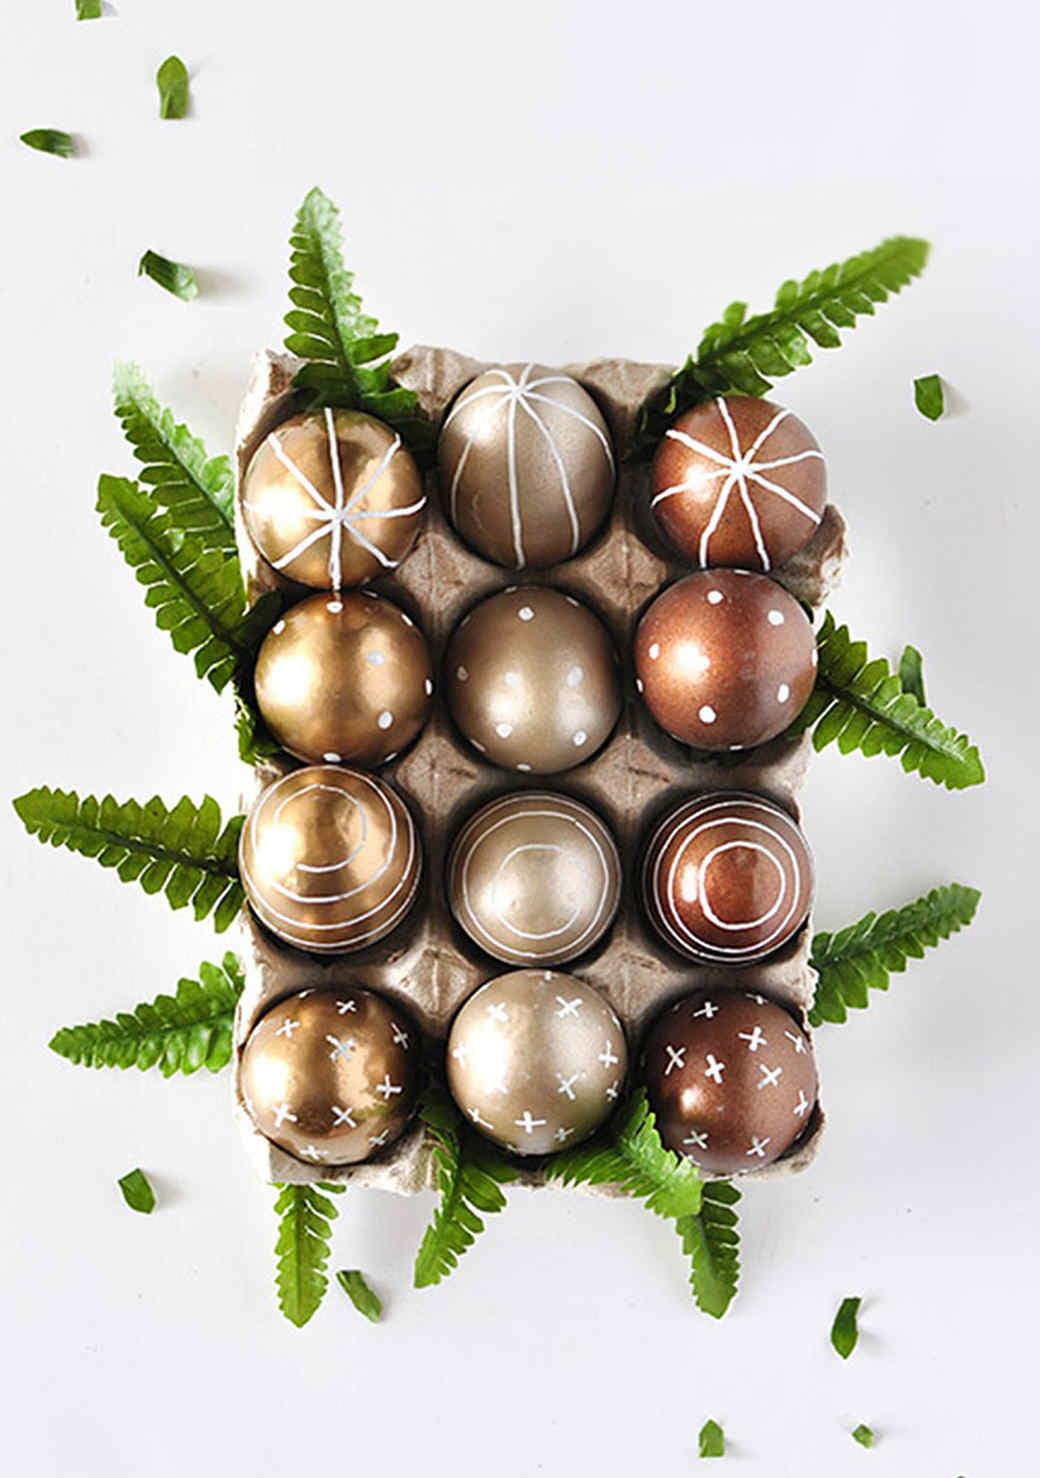 diy-metallic-easter-eggs-1215.jpg (skyword:211788)